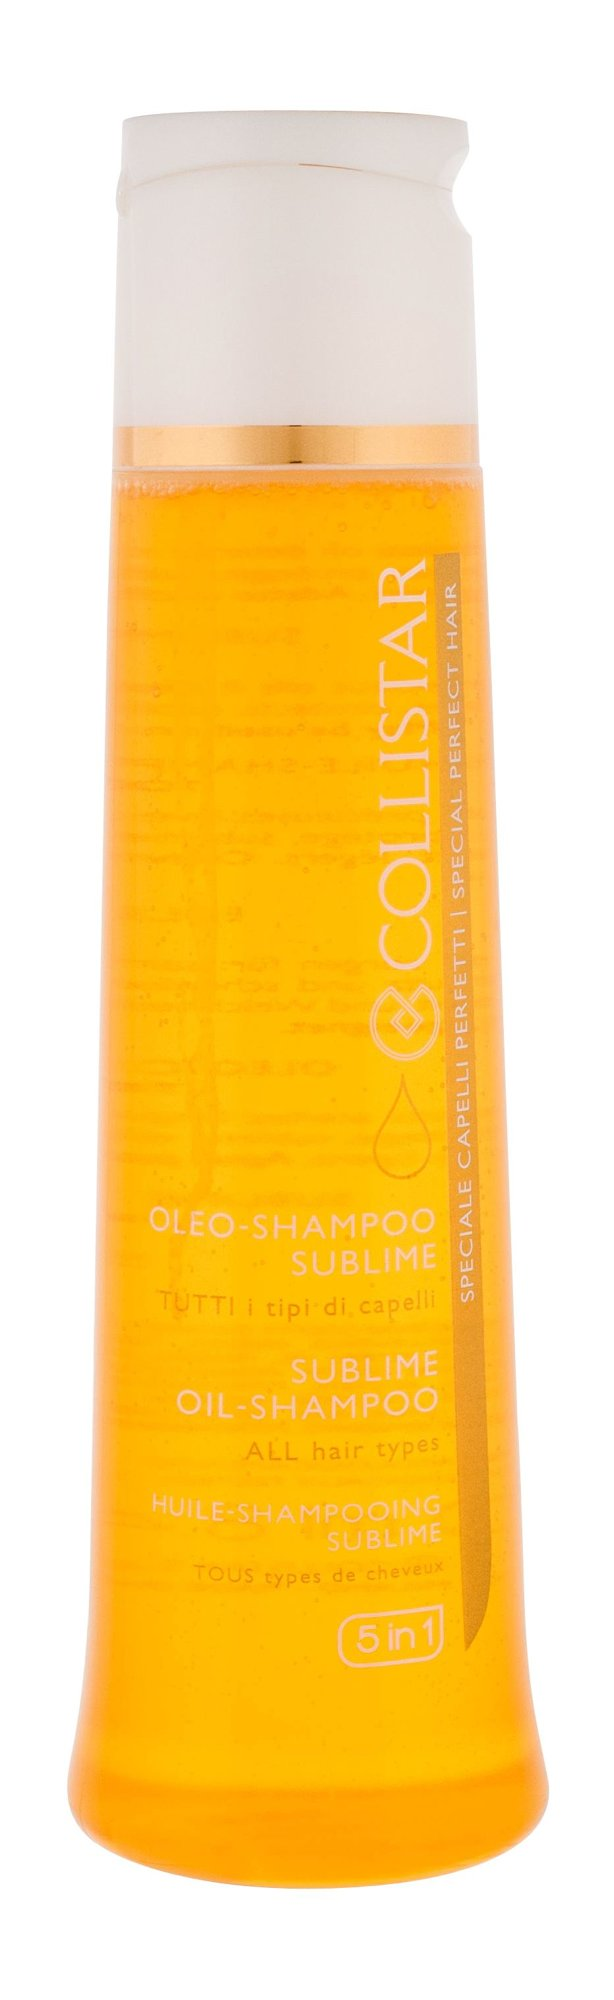 Collistar Sublime Oil Line Cosmetic 250ml